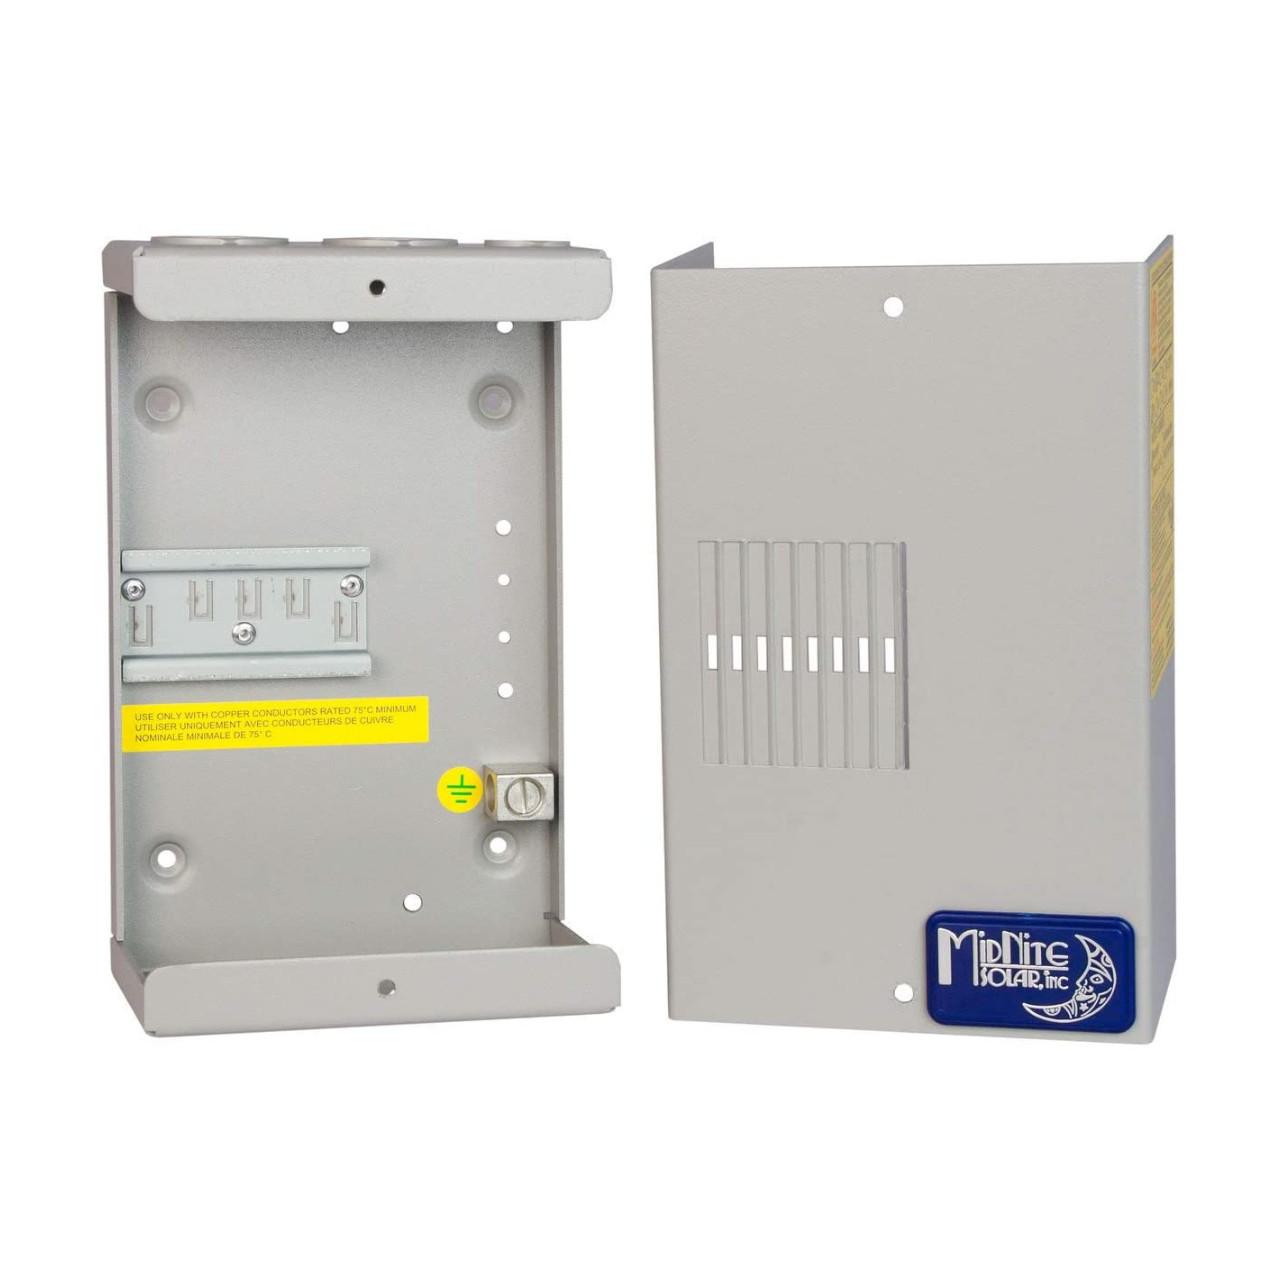 MidNite Solar - MNBIGBABY DC Combiner Box